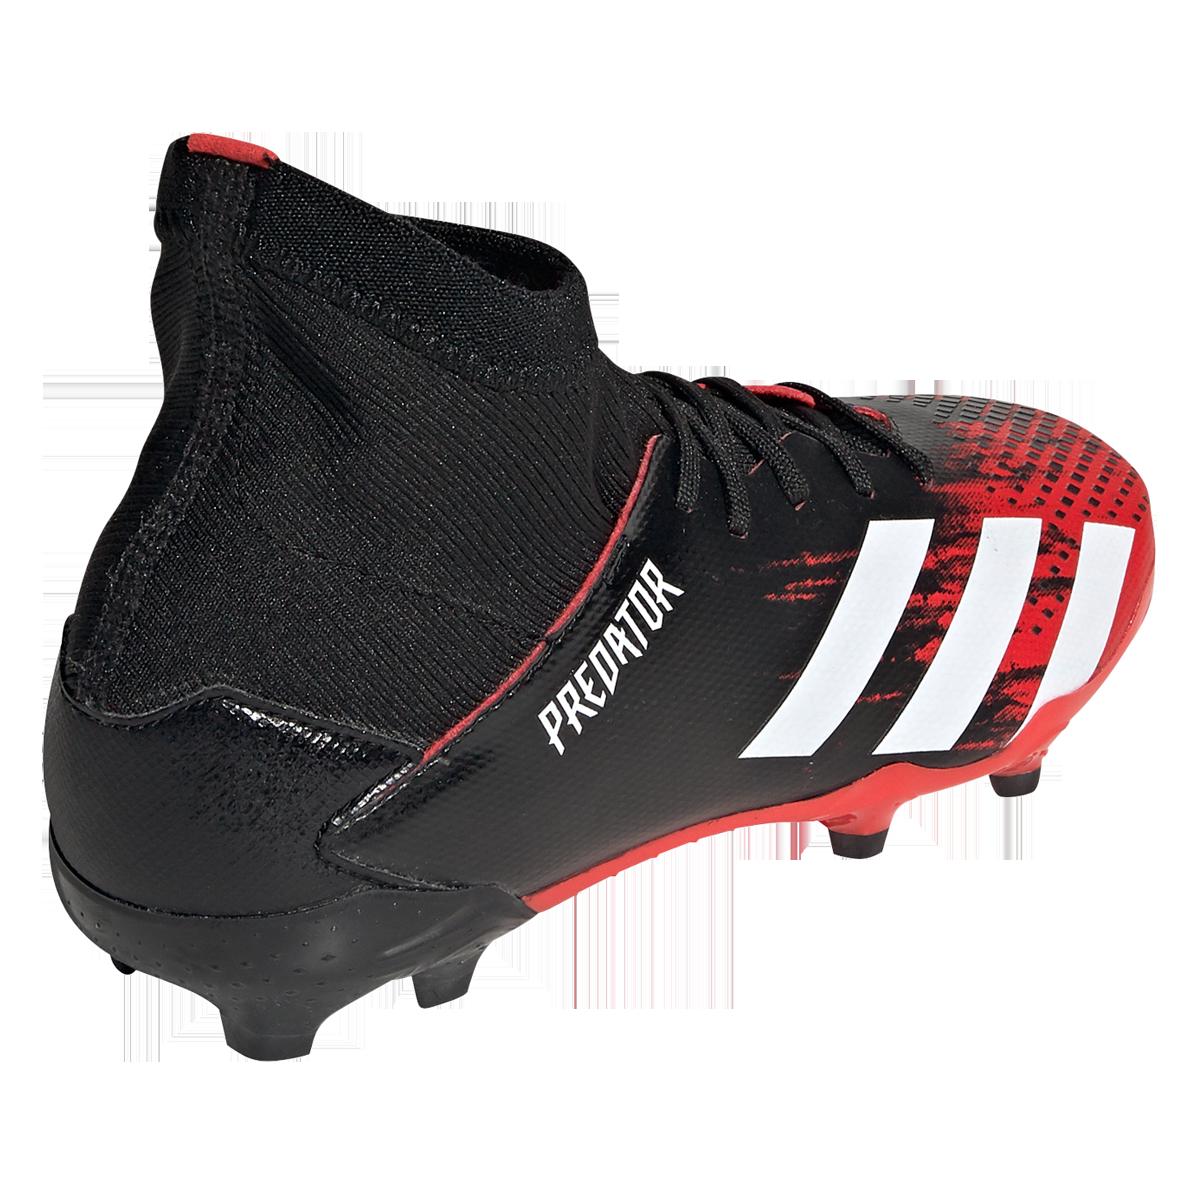 adidas Kinder Fußballschuh Predator 20.3 FG J schwarzrot